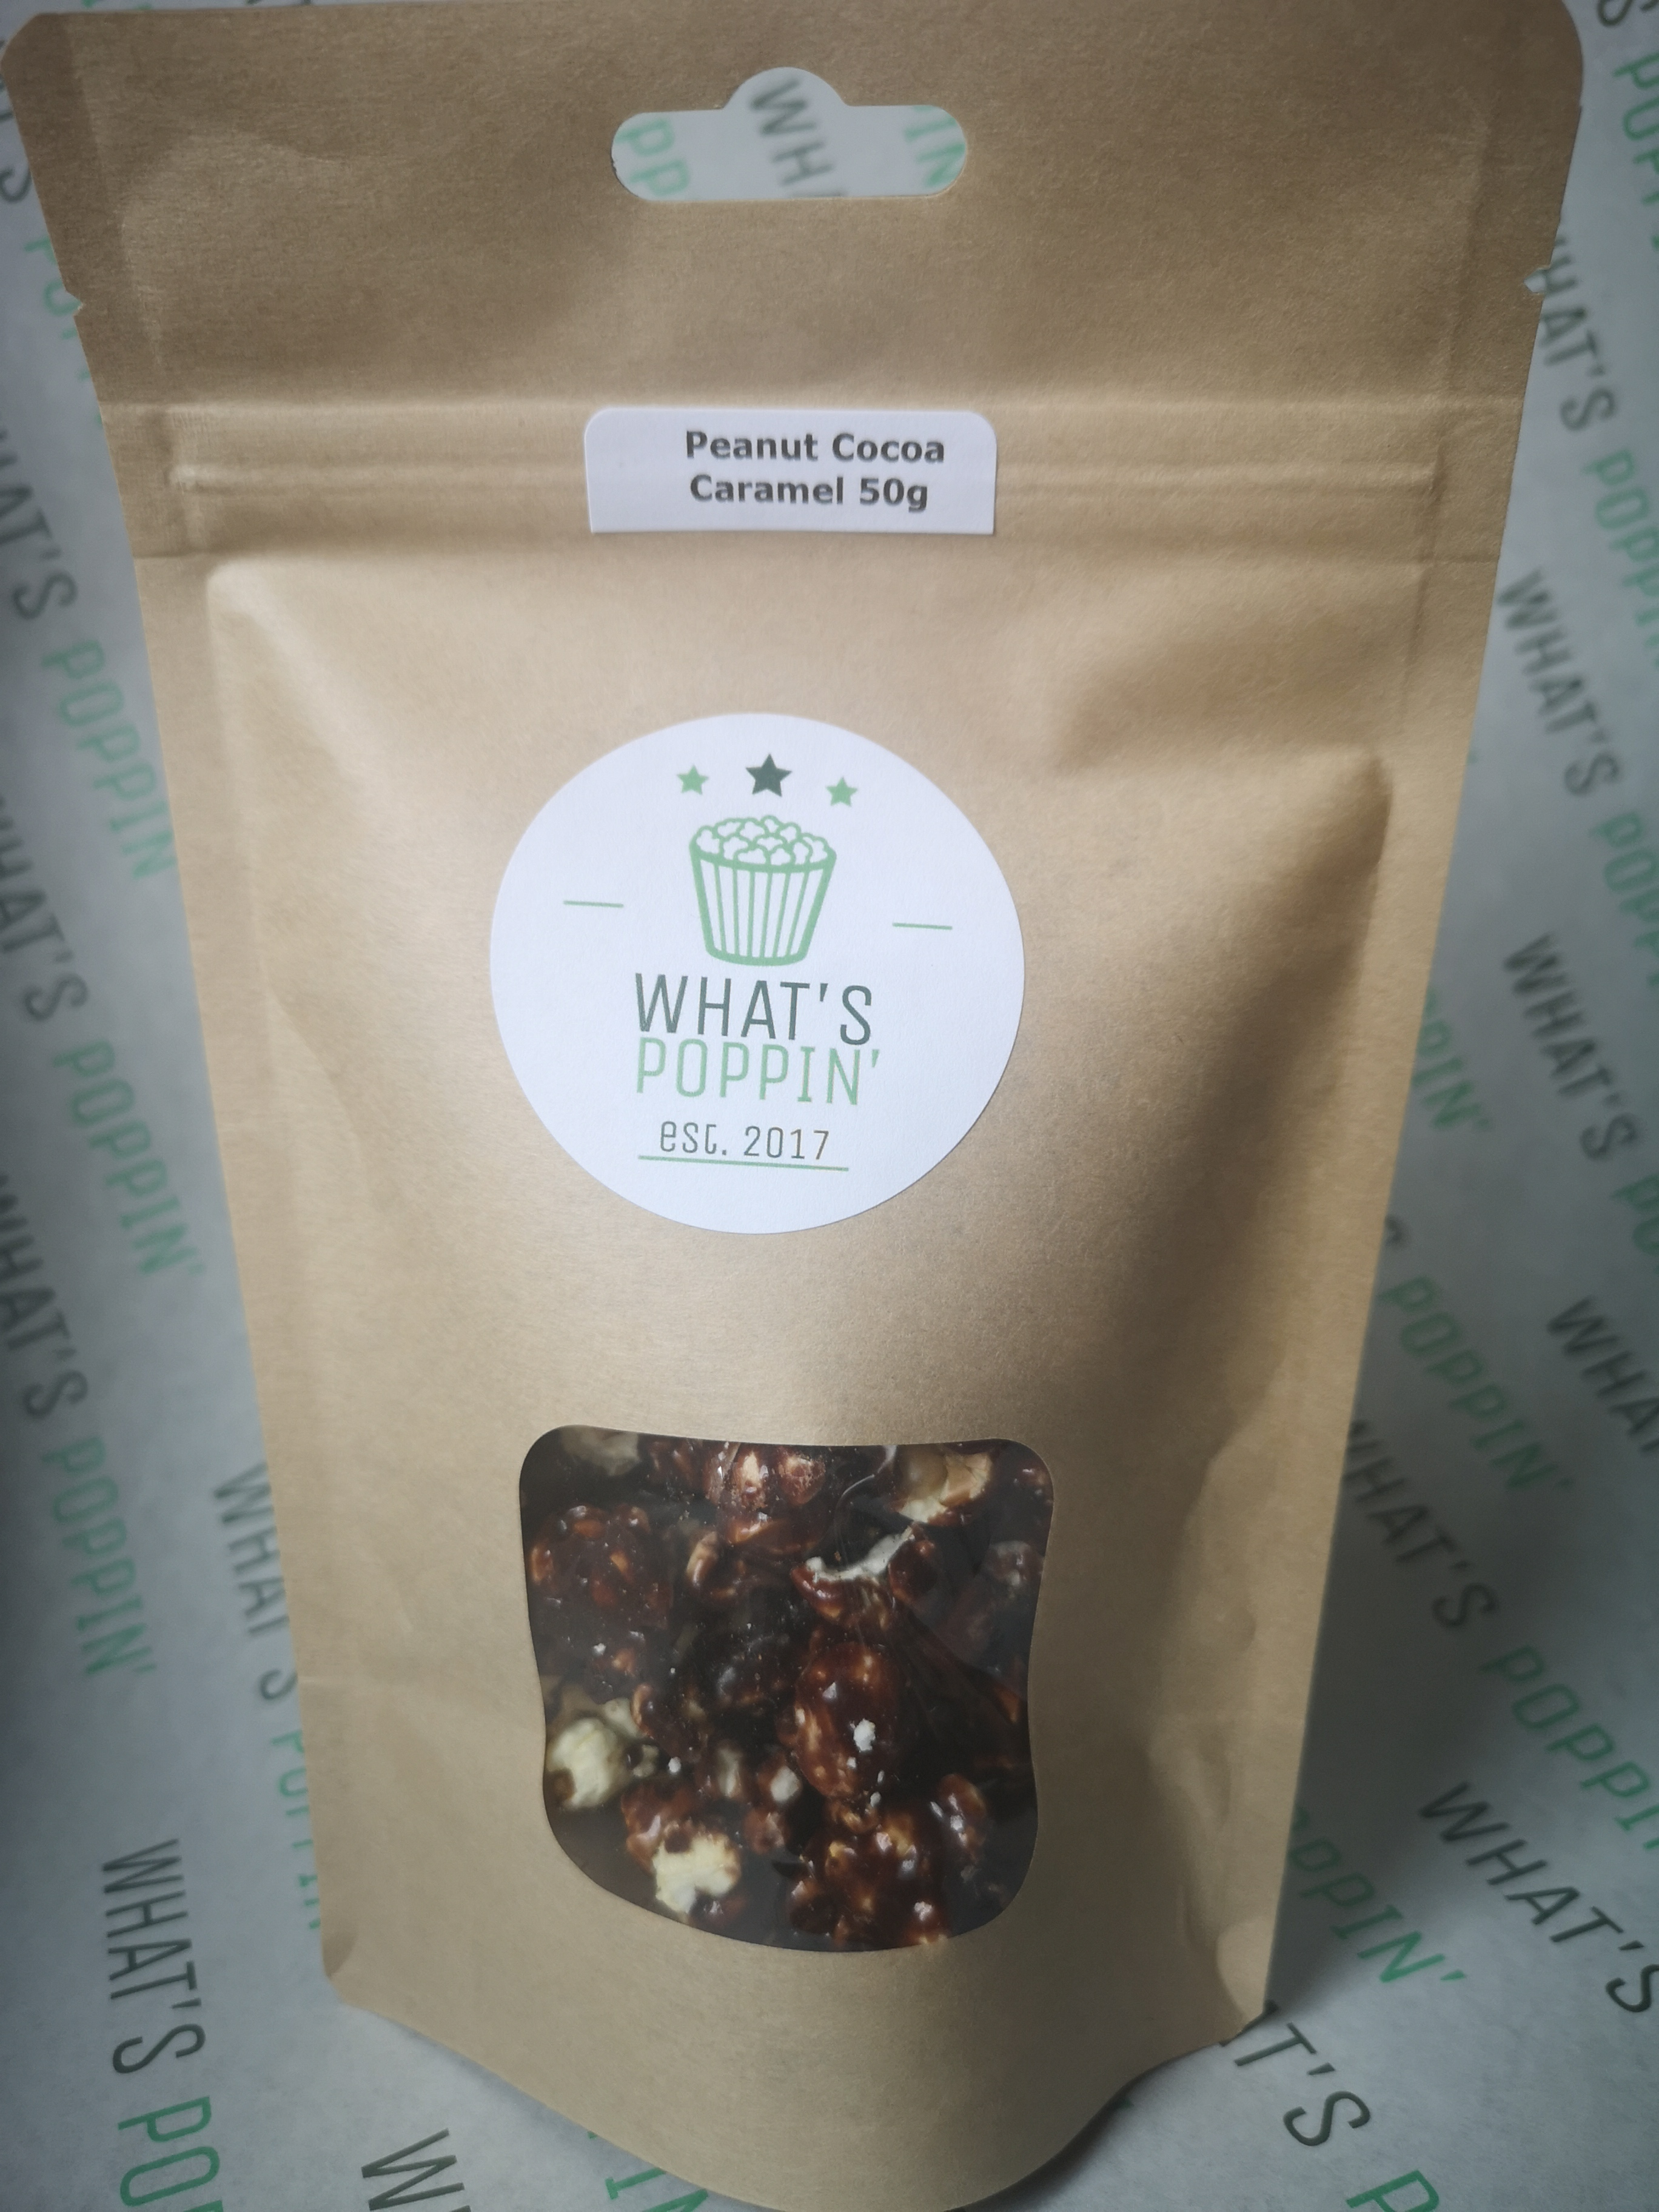 LIMITED EDITION! Peanut Cocoa Caramel